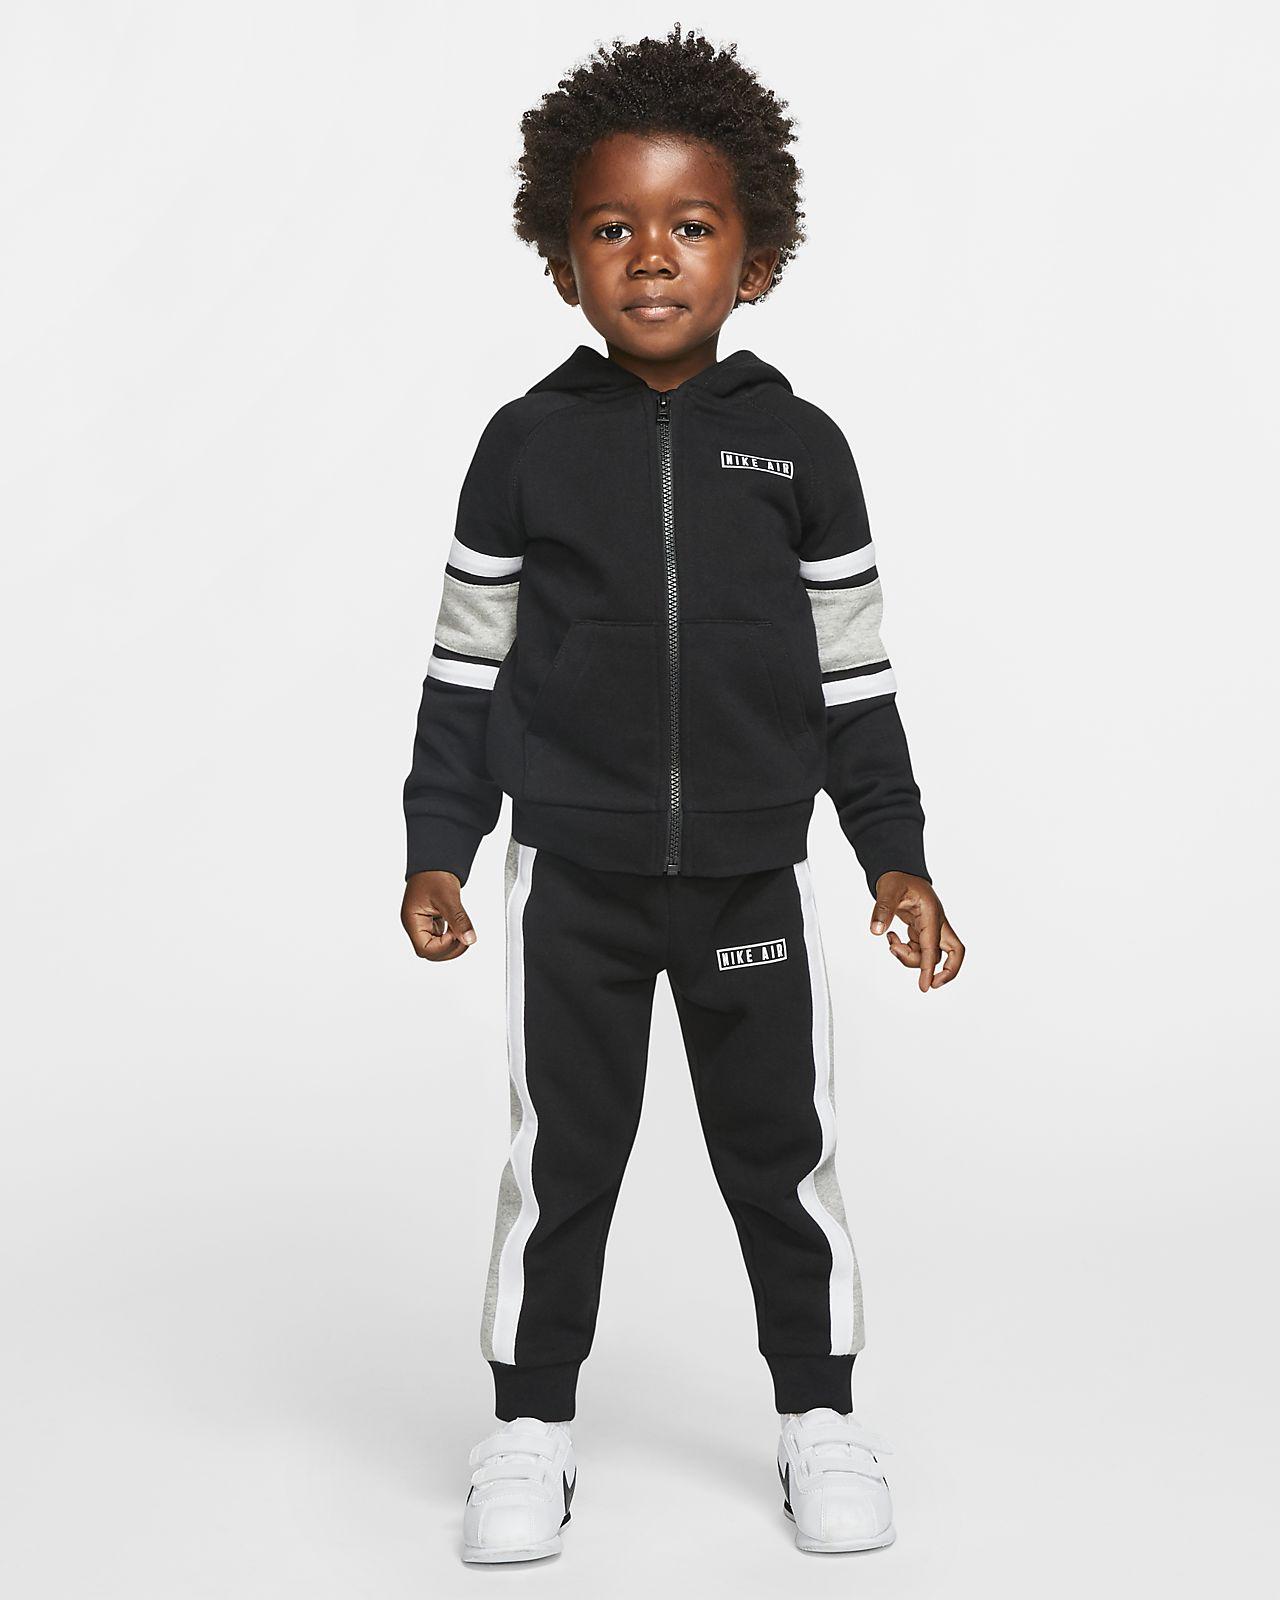 Nike Air婴童 2 件套